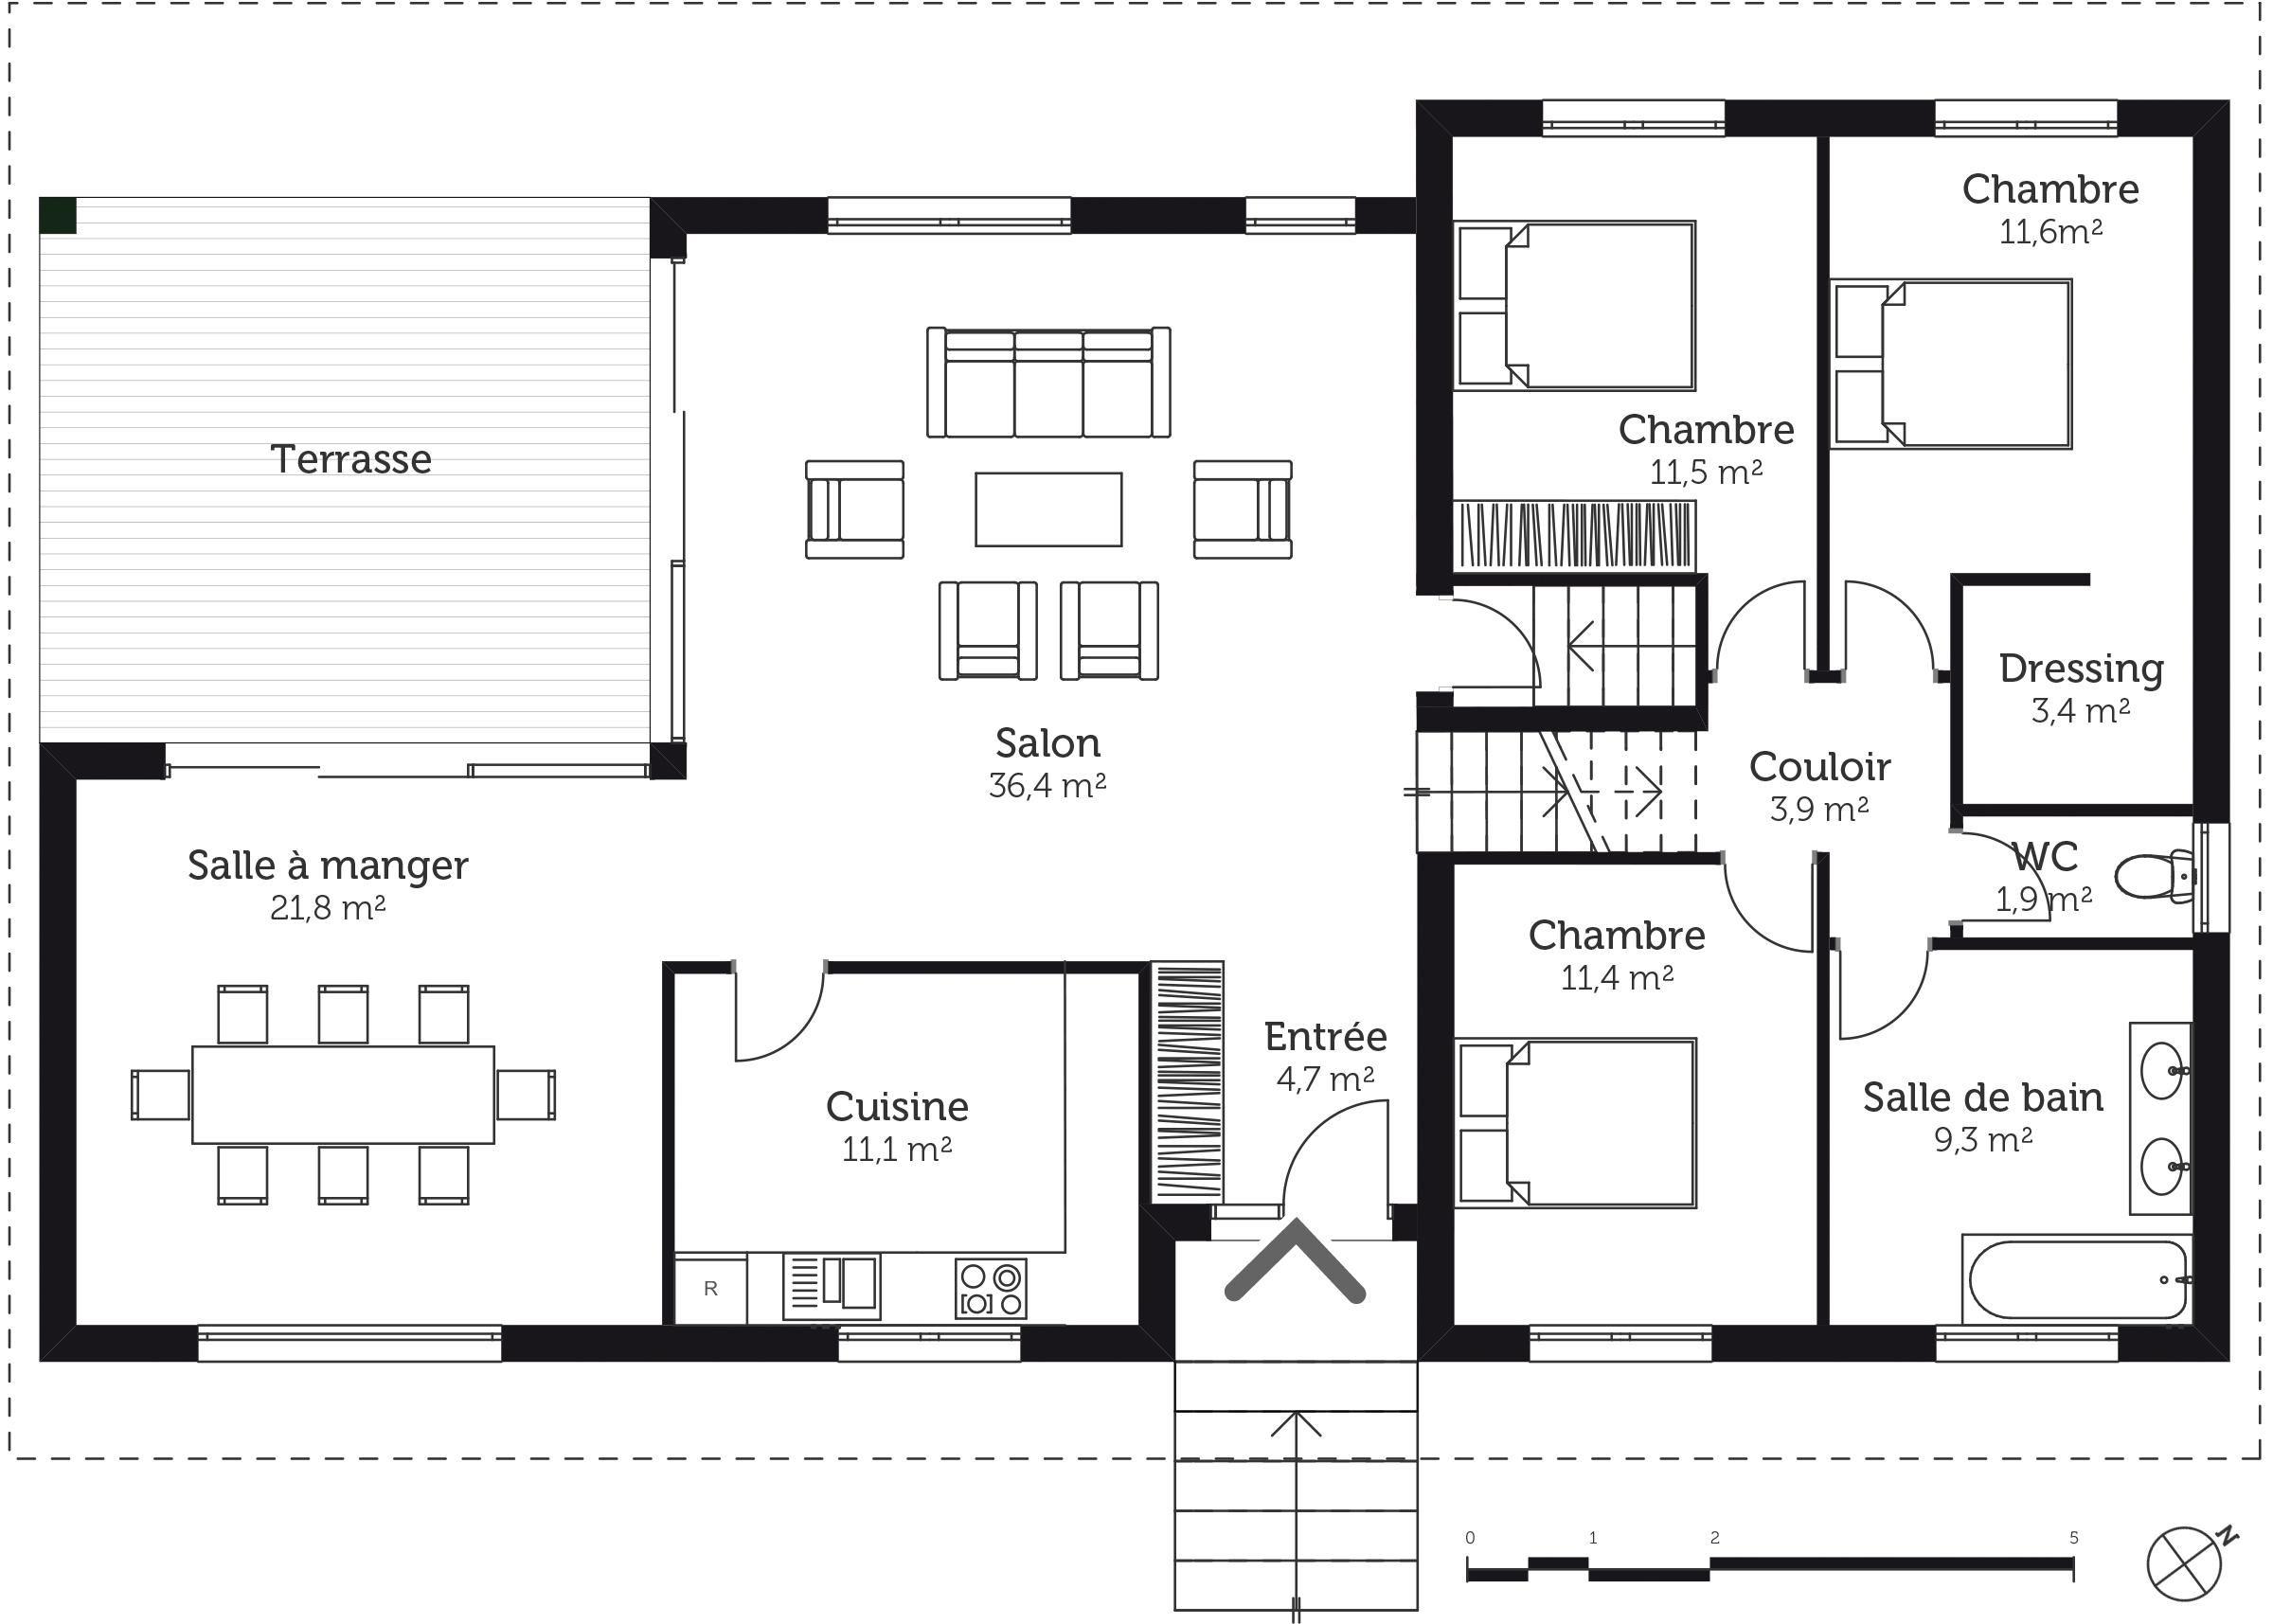 Maison Plan Avec Sous Sol Basement Remodeling Remodel How To Plan